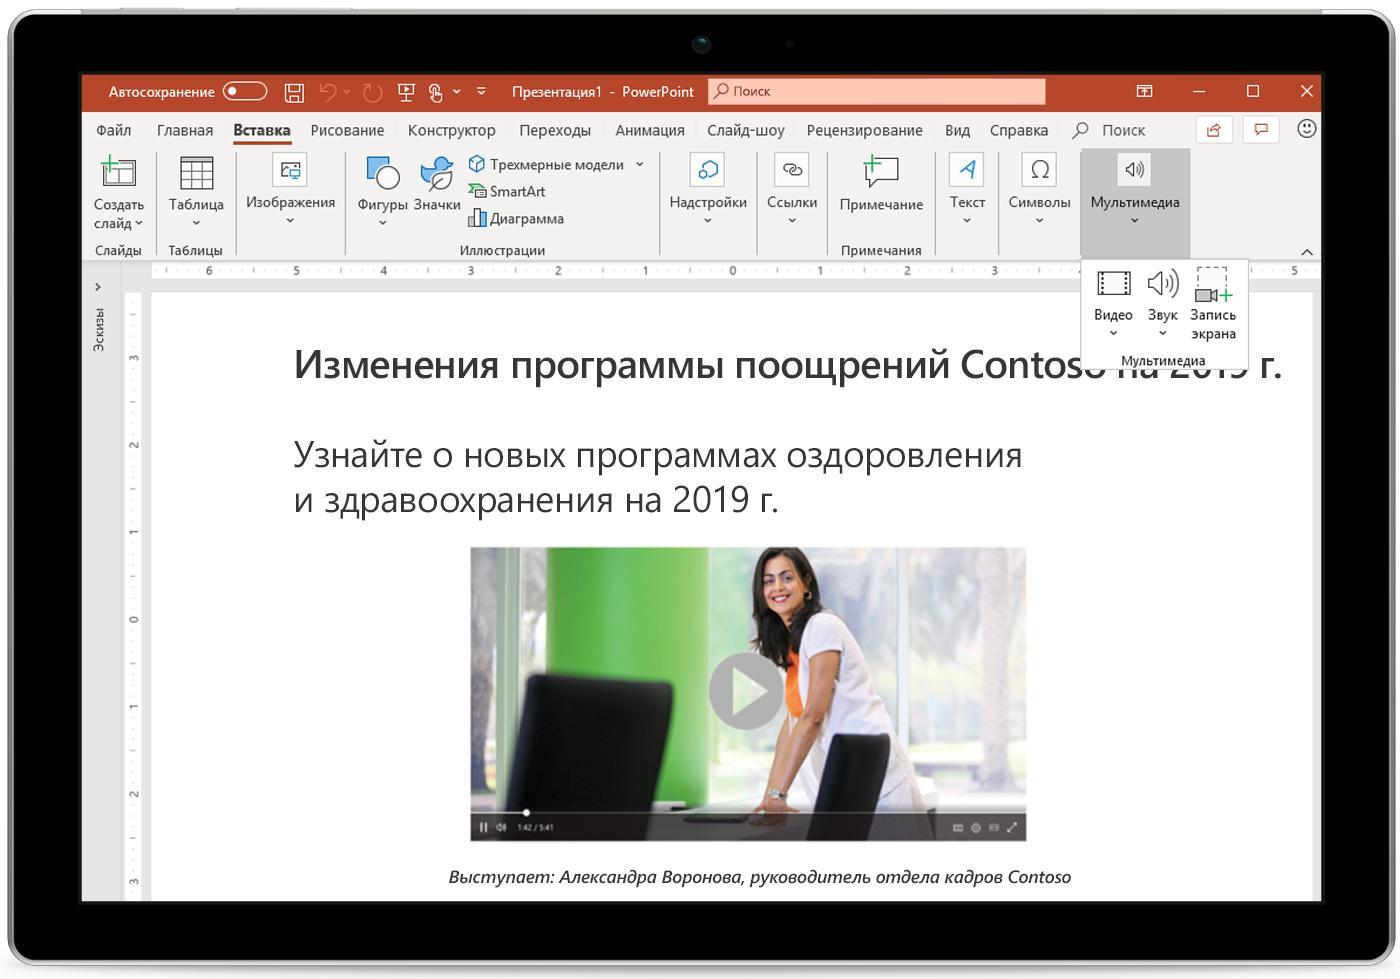 Слайд PowerPoint на экране планшета.